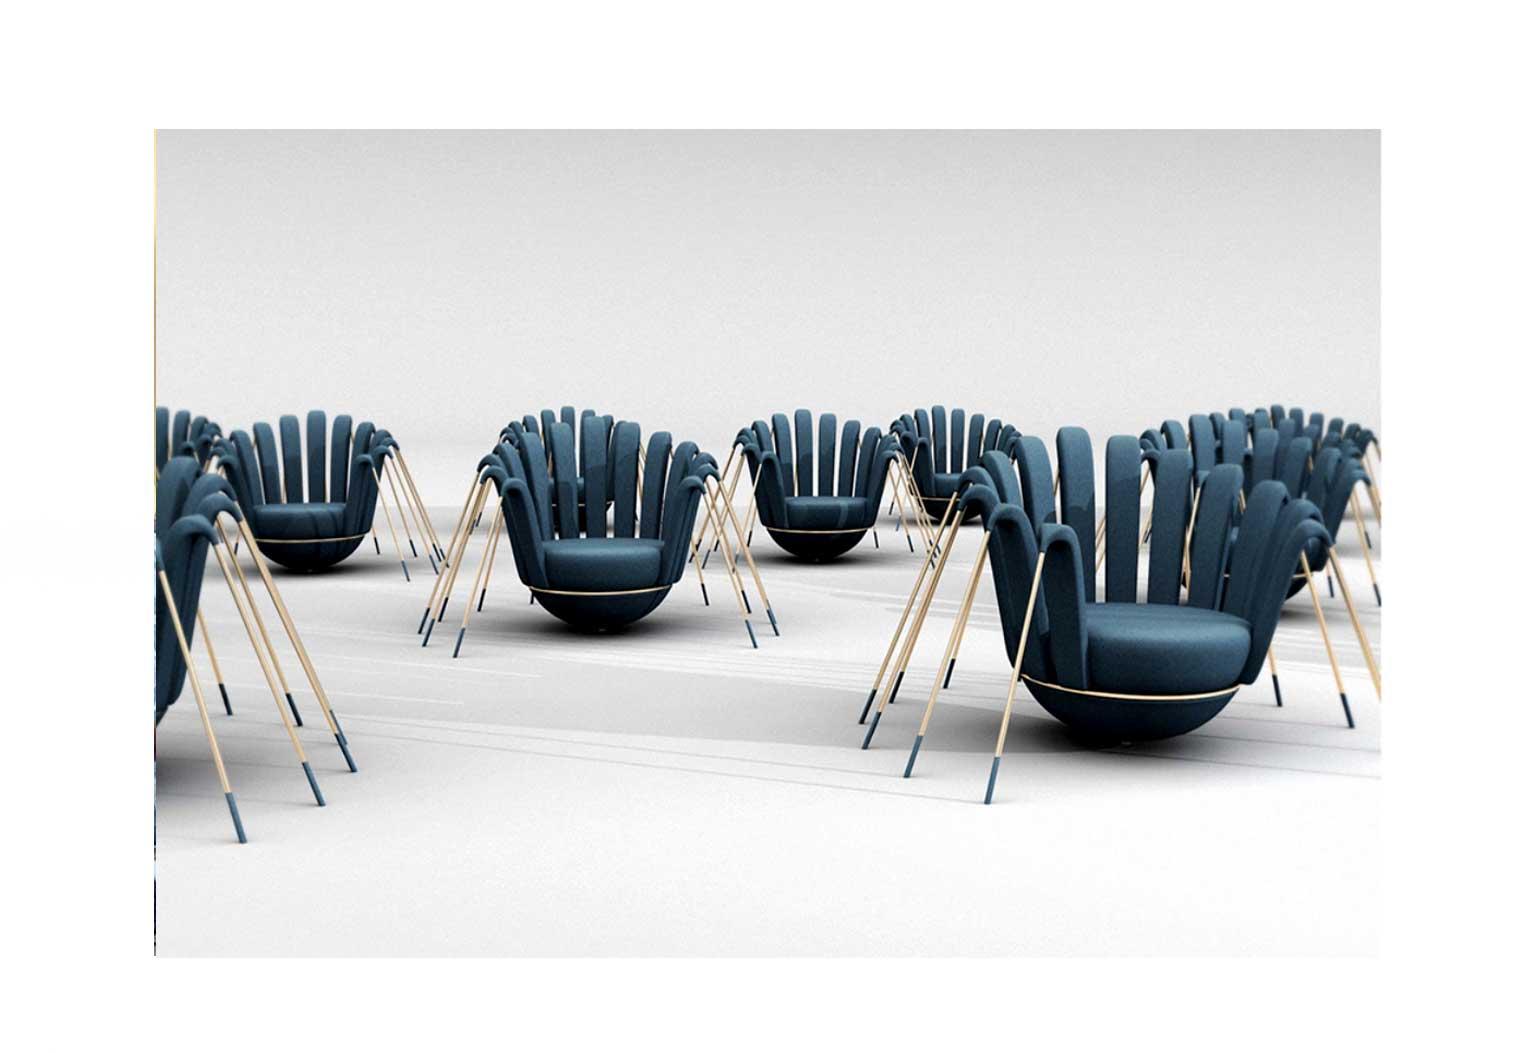 Design An Art centric Room040g - چگونه یک اتاق هنری را طراحی کنیم؟